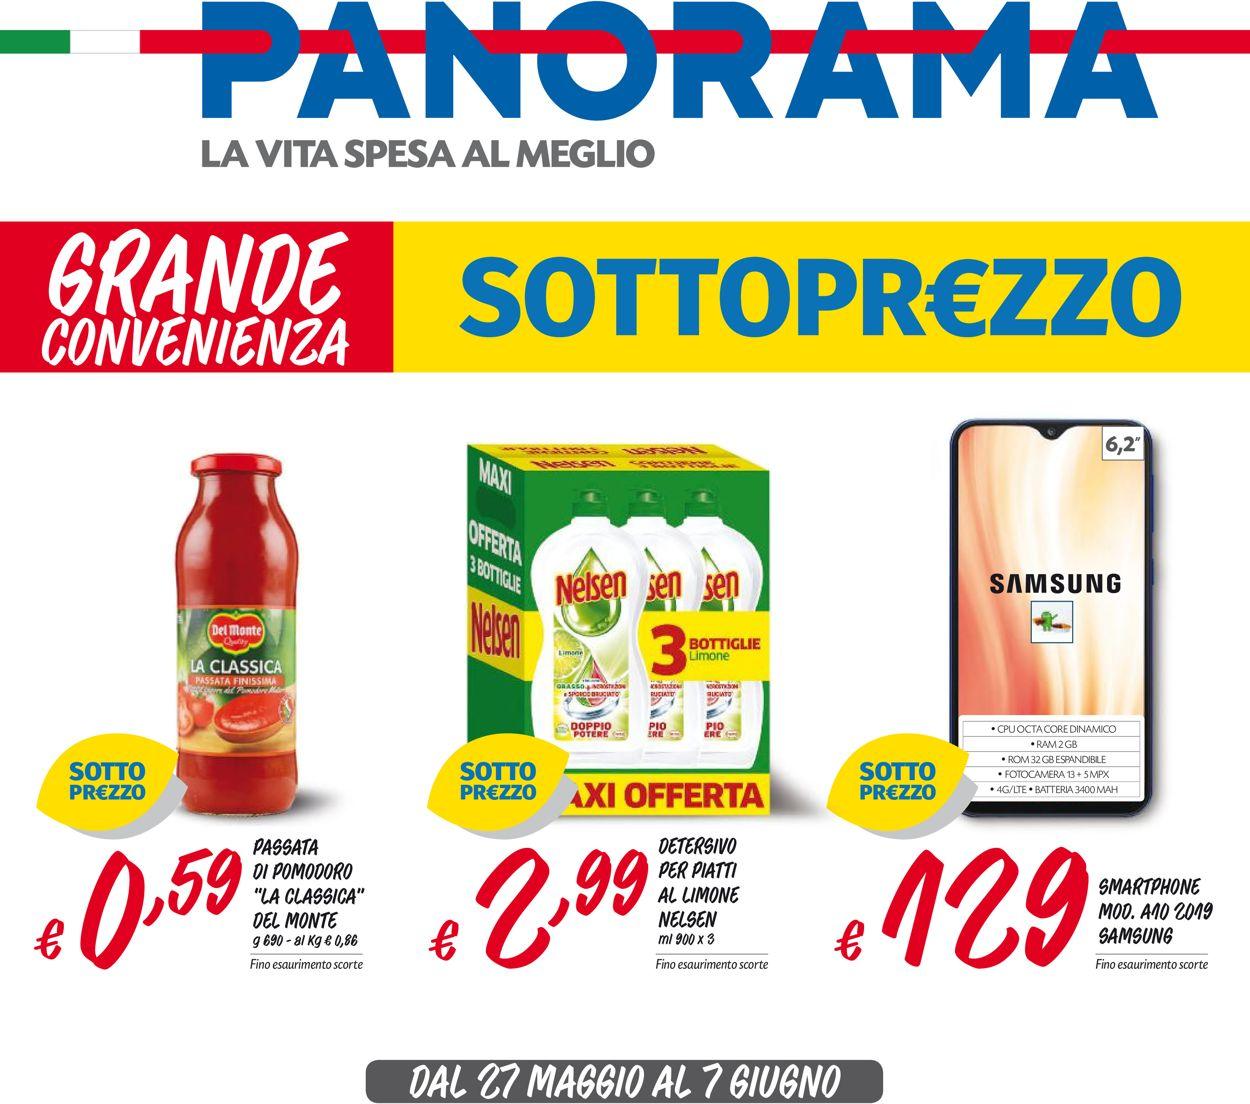 Volantino Pam Panorama - Offerte 27/05-07/06/2020